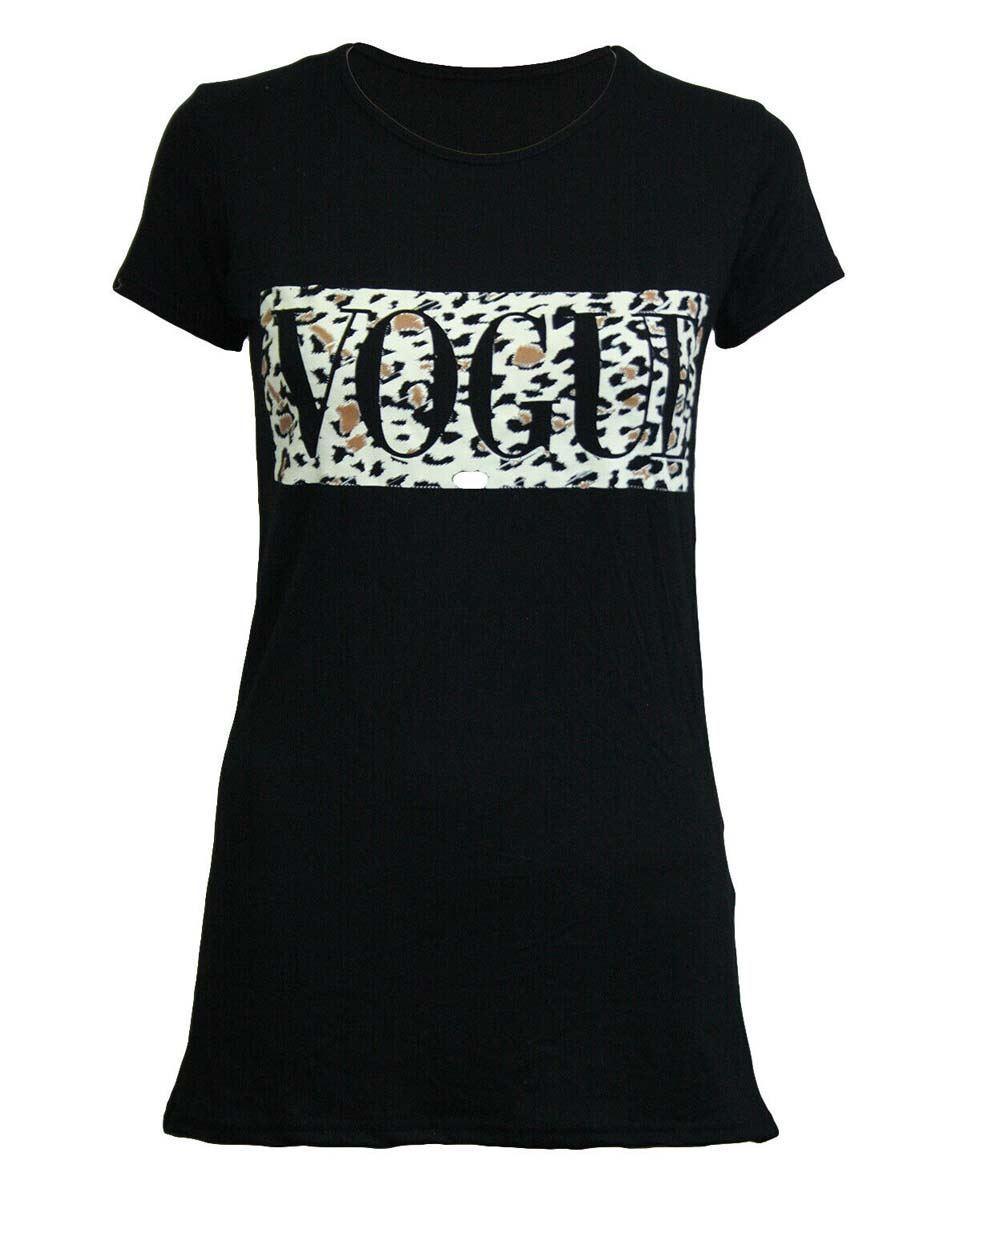 thumbnail 19 - Womens OH HONEY Slogan Fashion T-Shirt Ladies Casual Summer Short Sleeve Tops